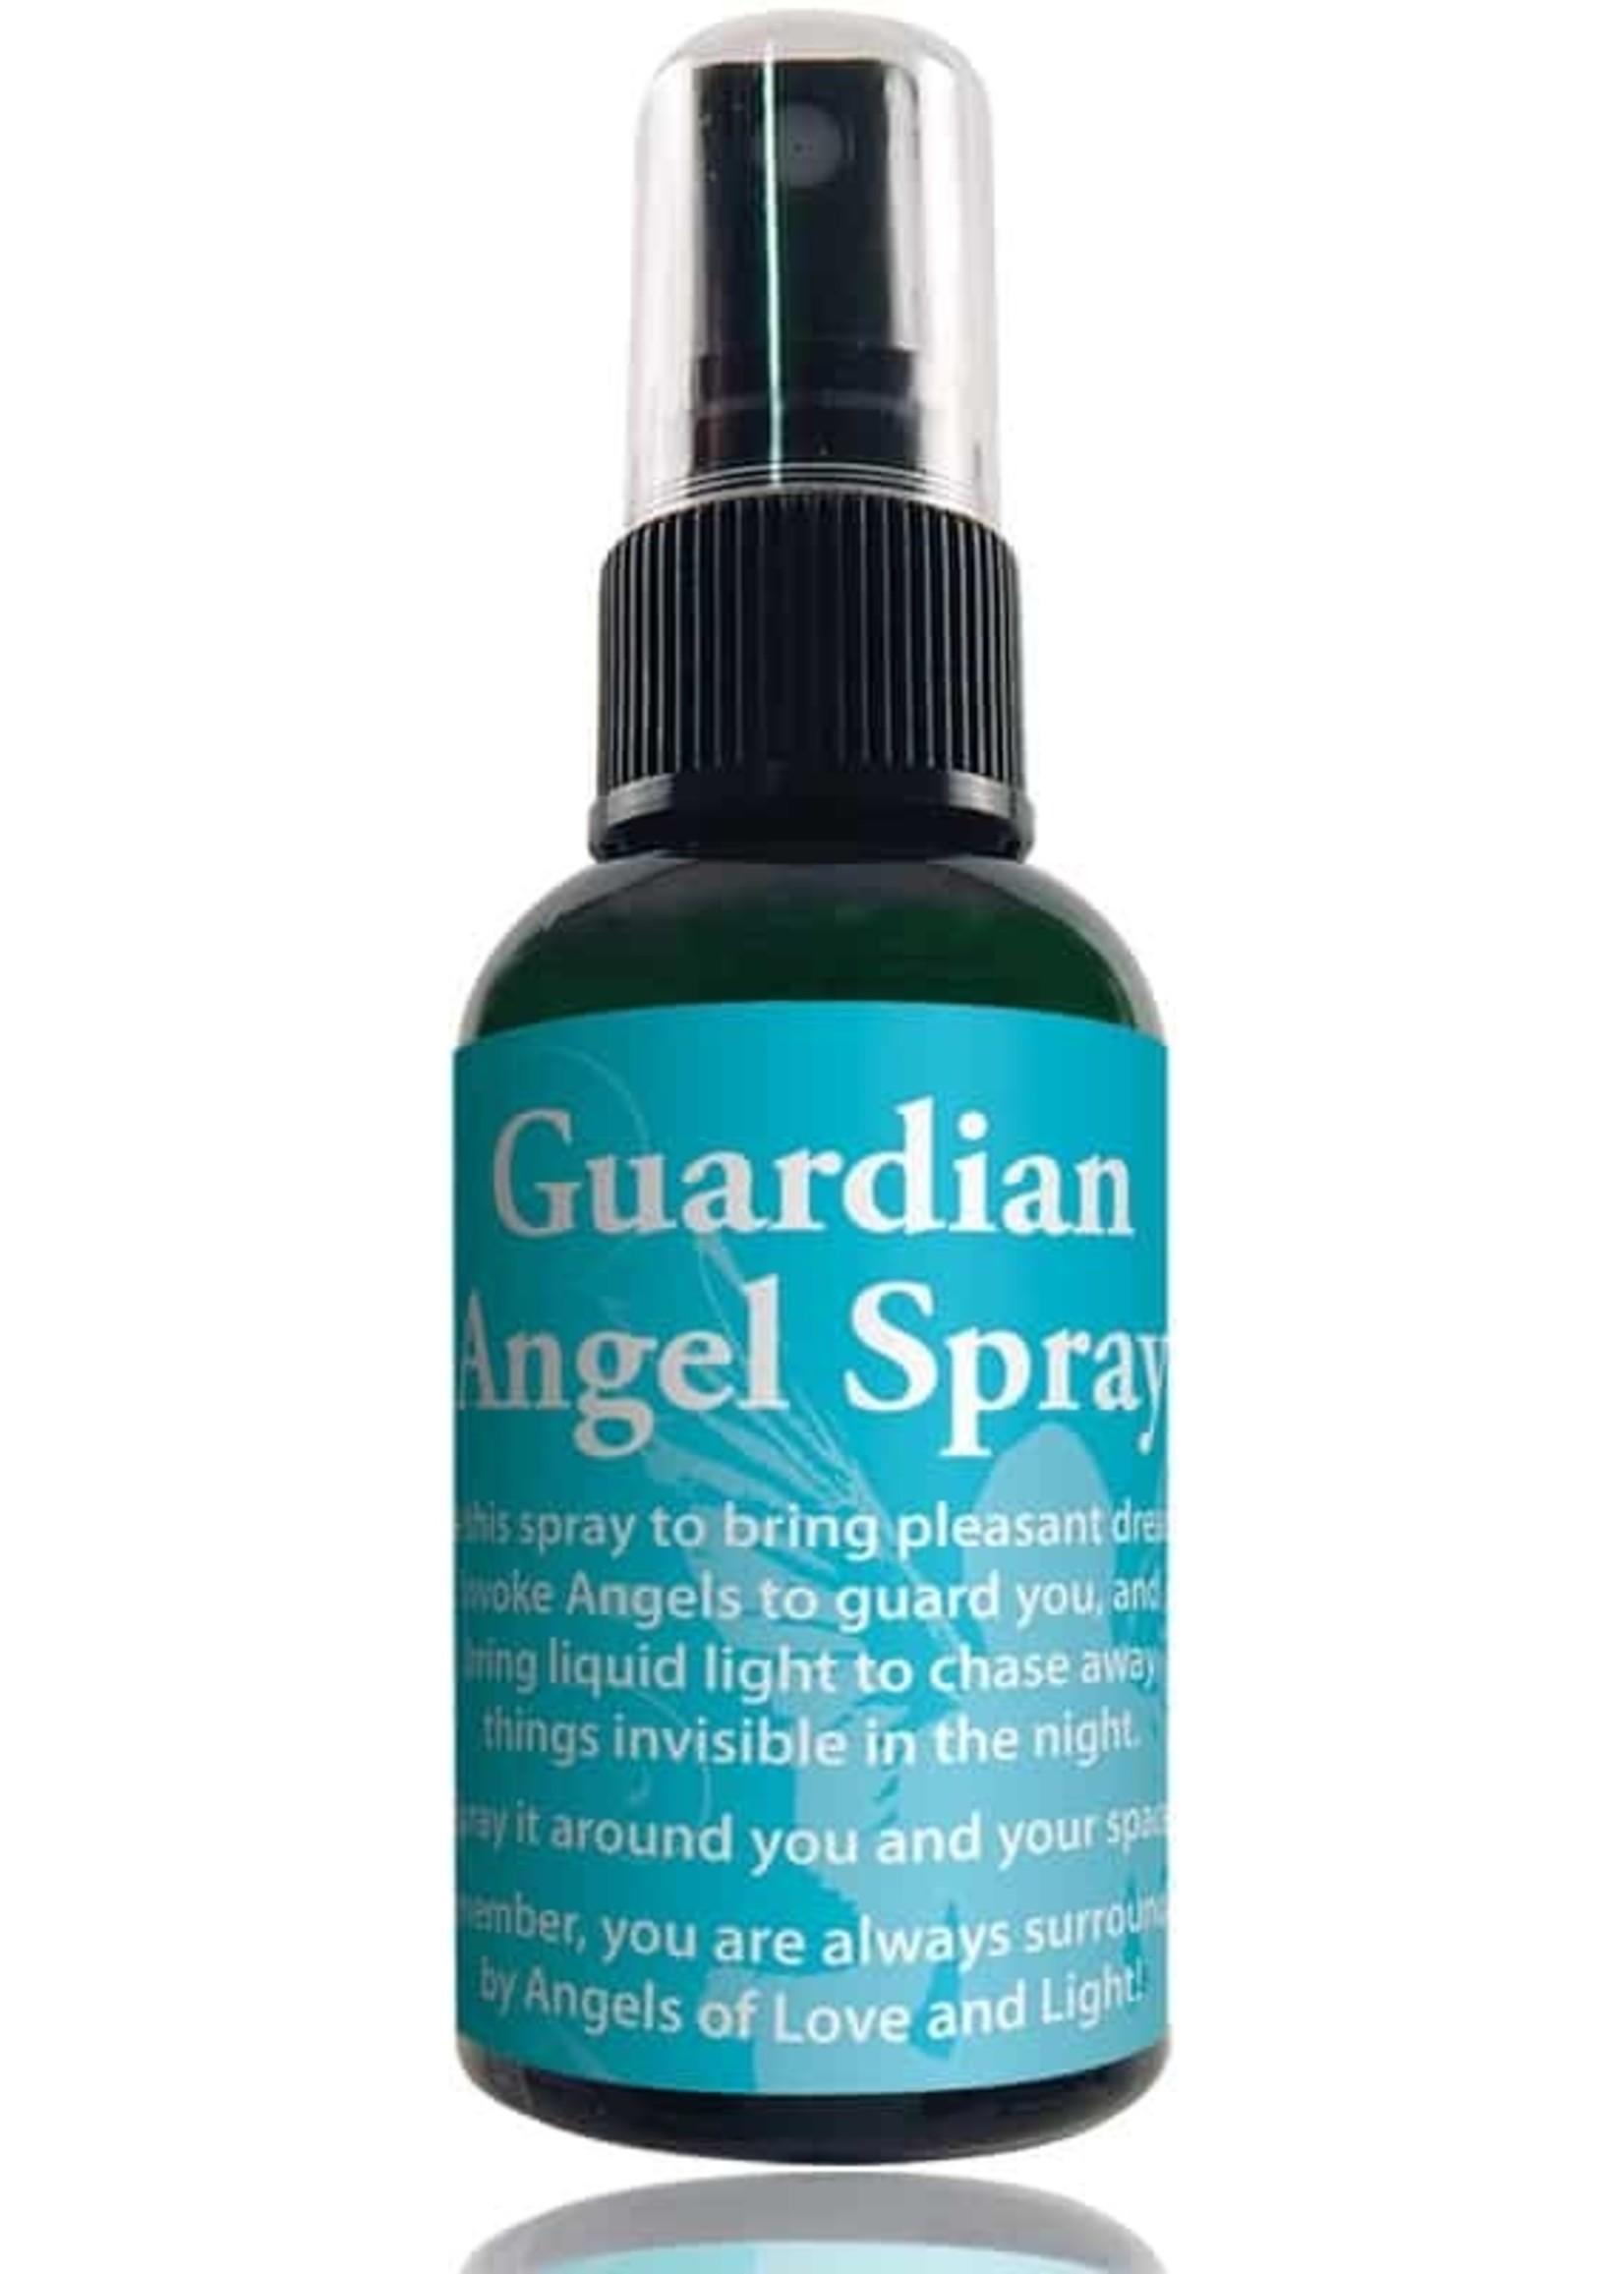 Guardian Angel Spray